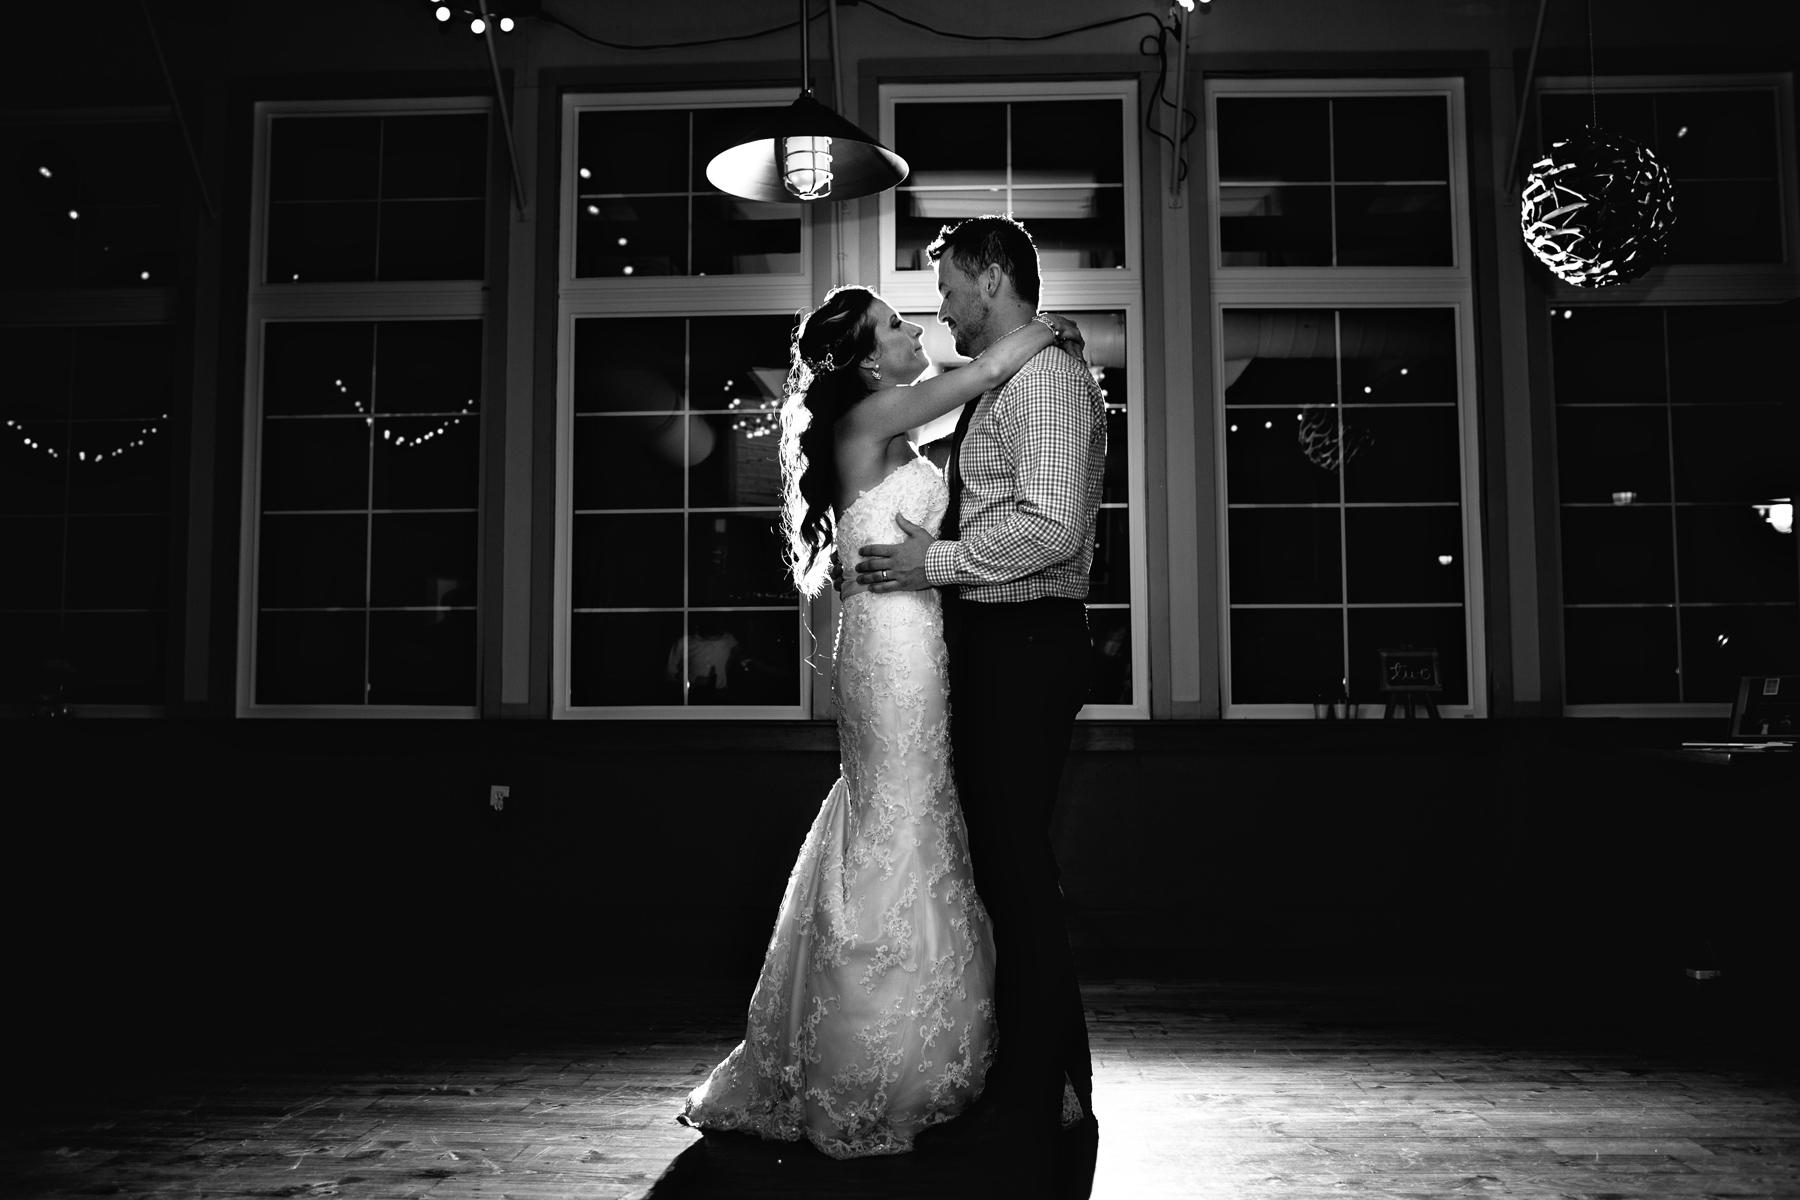 063-awesome-pei-wedding-photography-kandisebrown